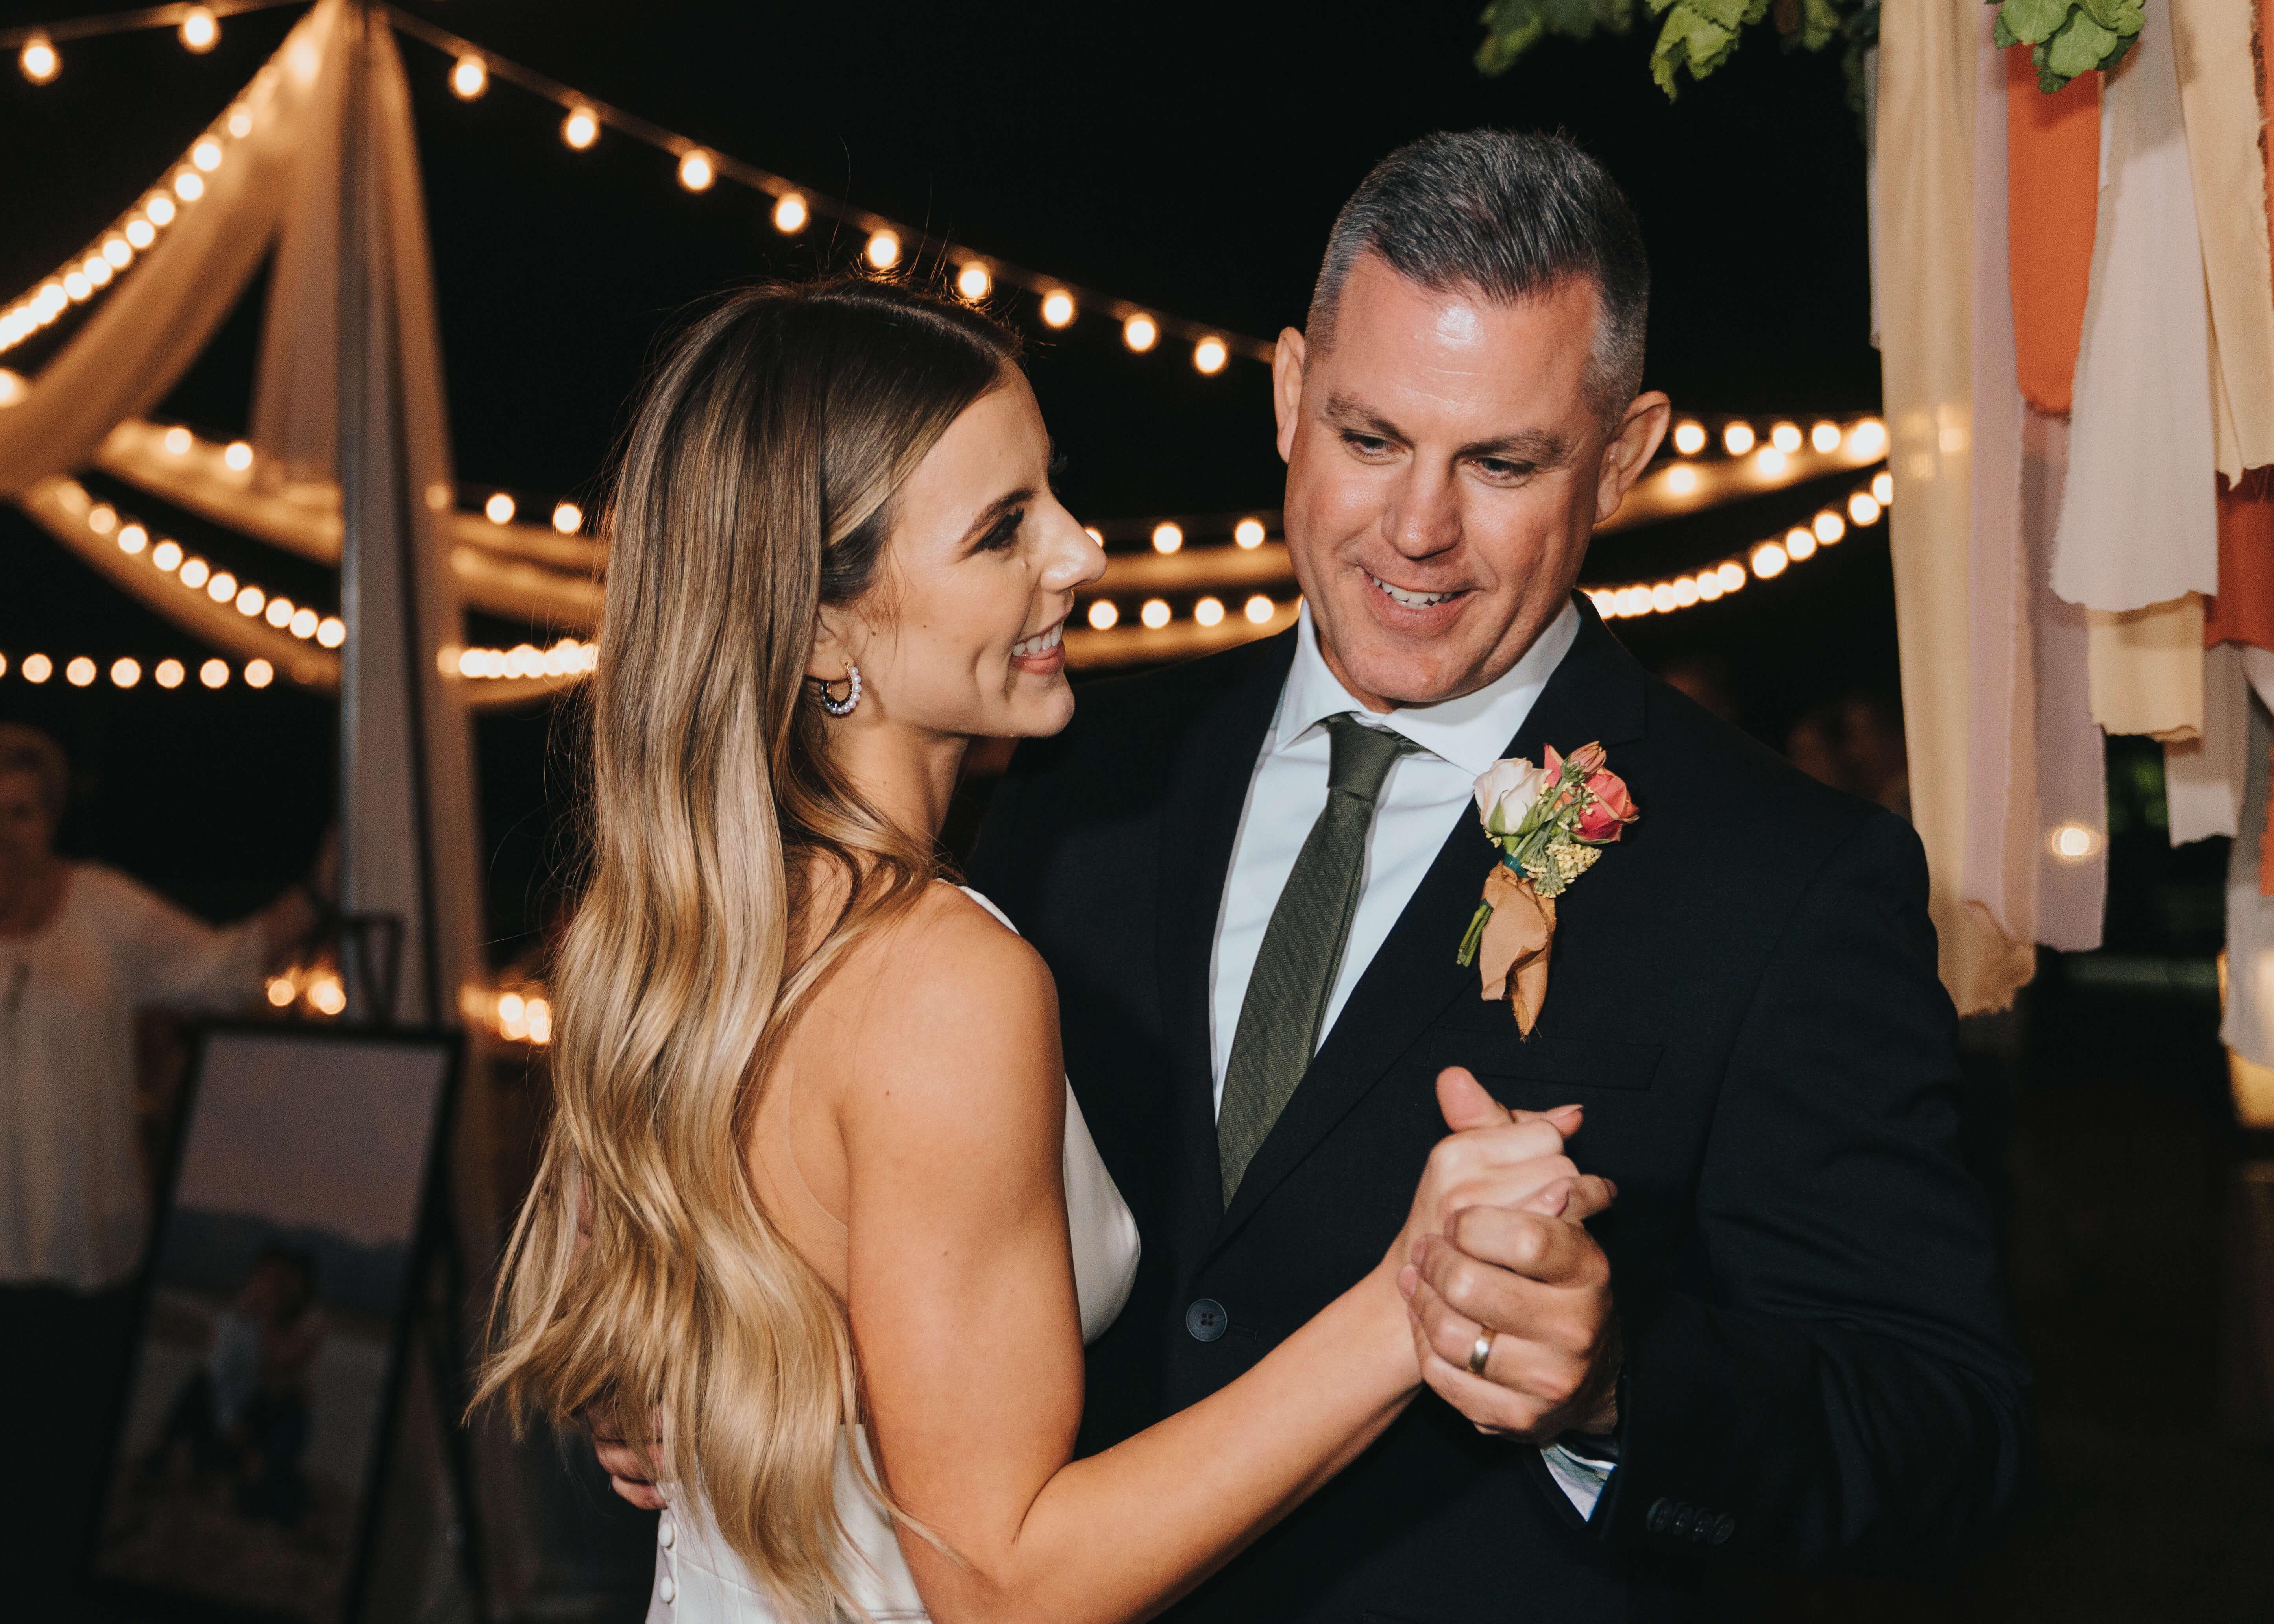 cute first dance daddy daughter wedding photo